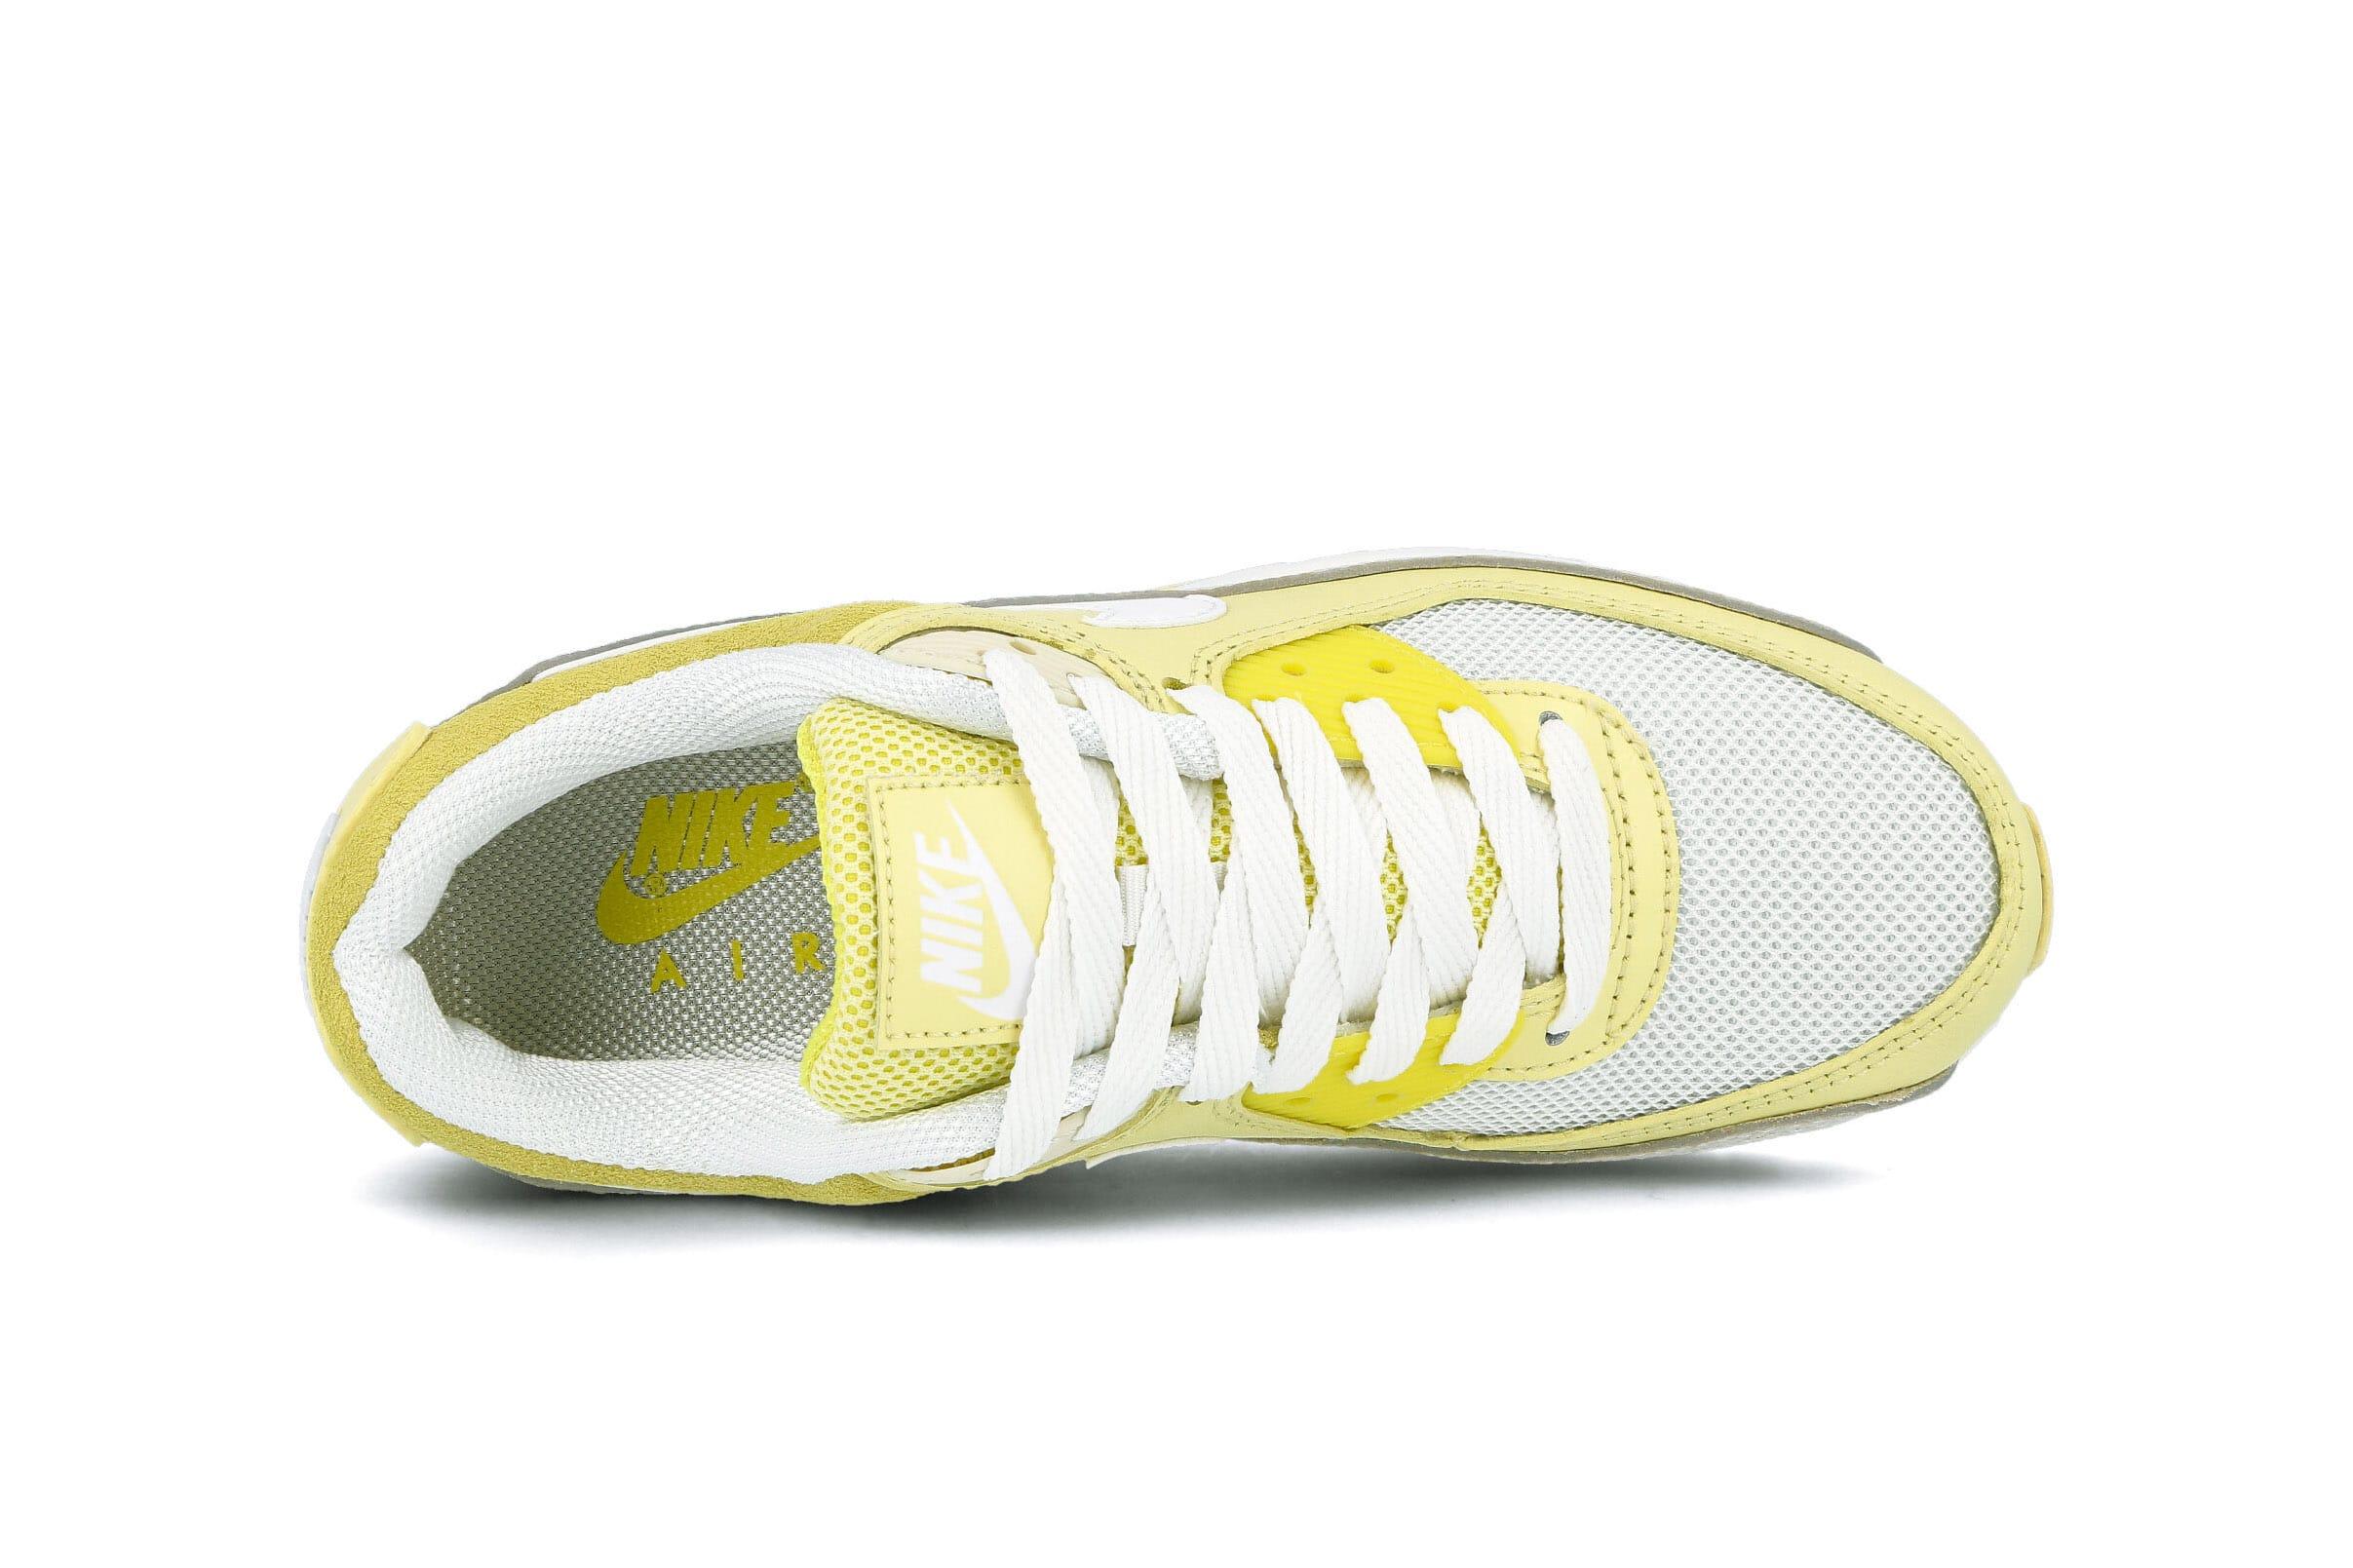 Nike Air Max 90 Pastel Yellow/Grey